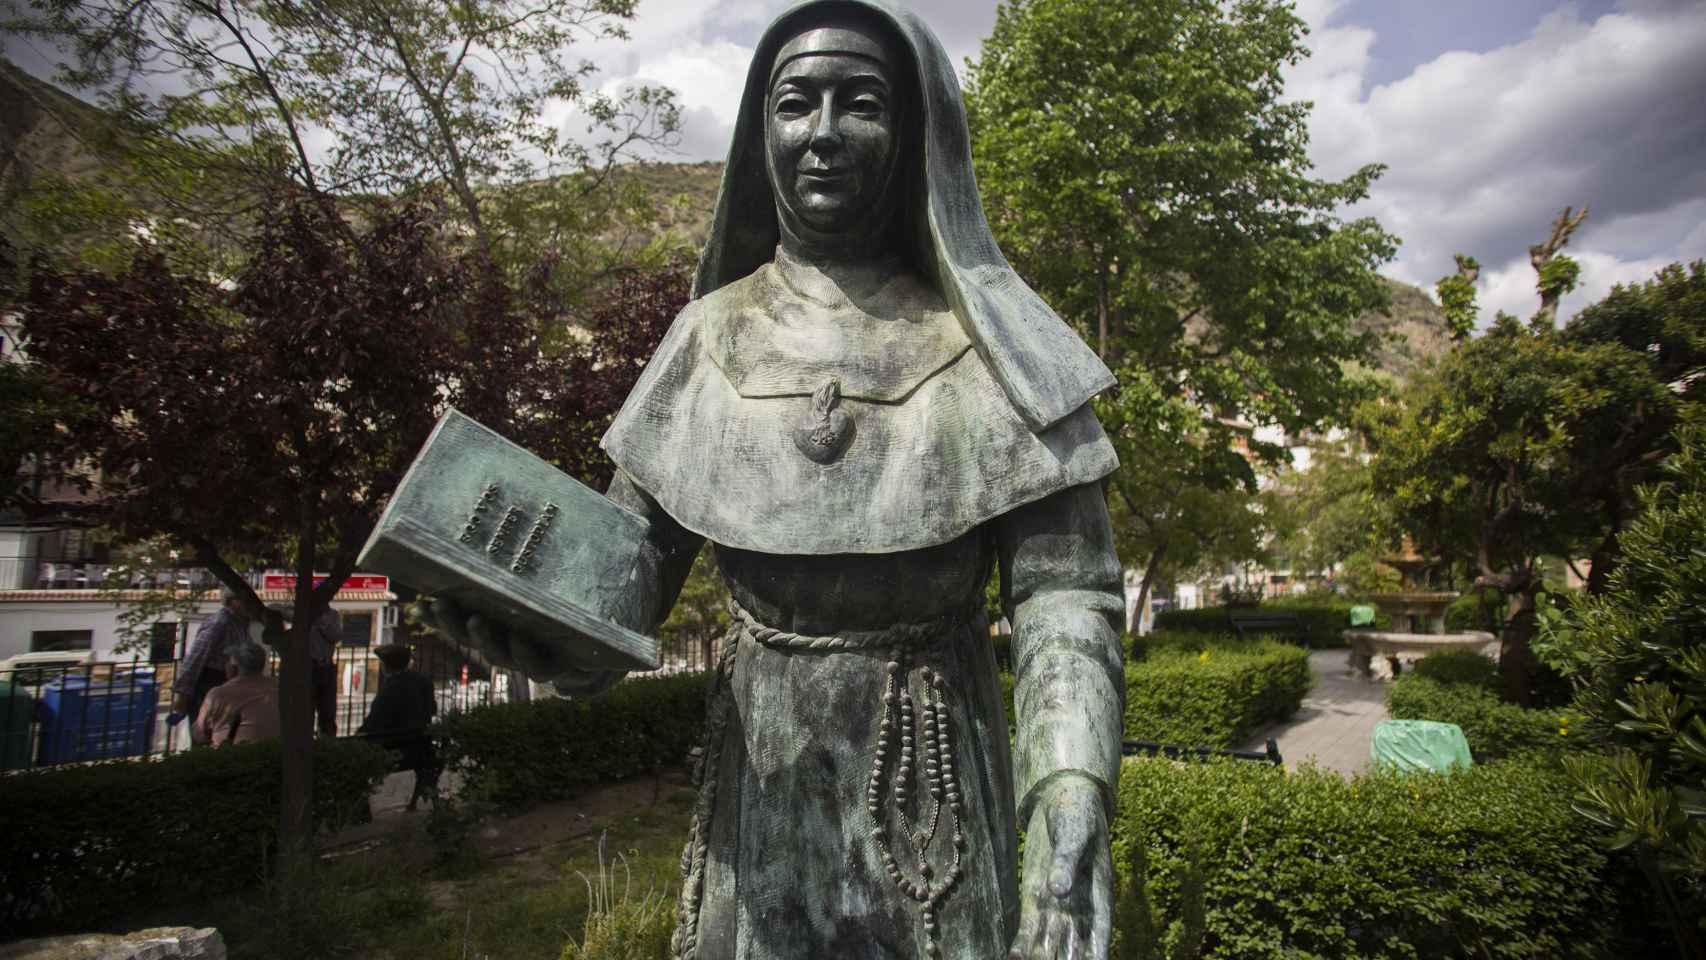 Estatua de una monja a la entrada de Monachil (Granada)